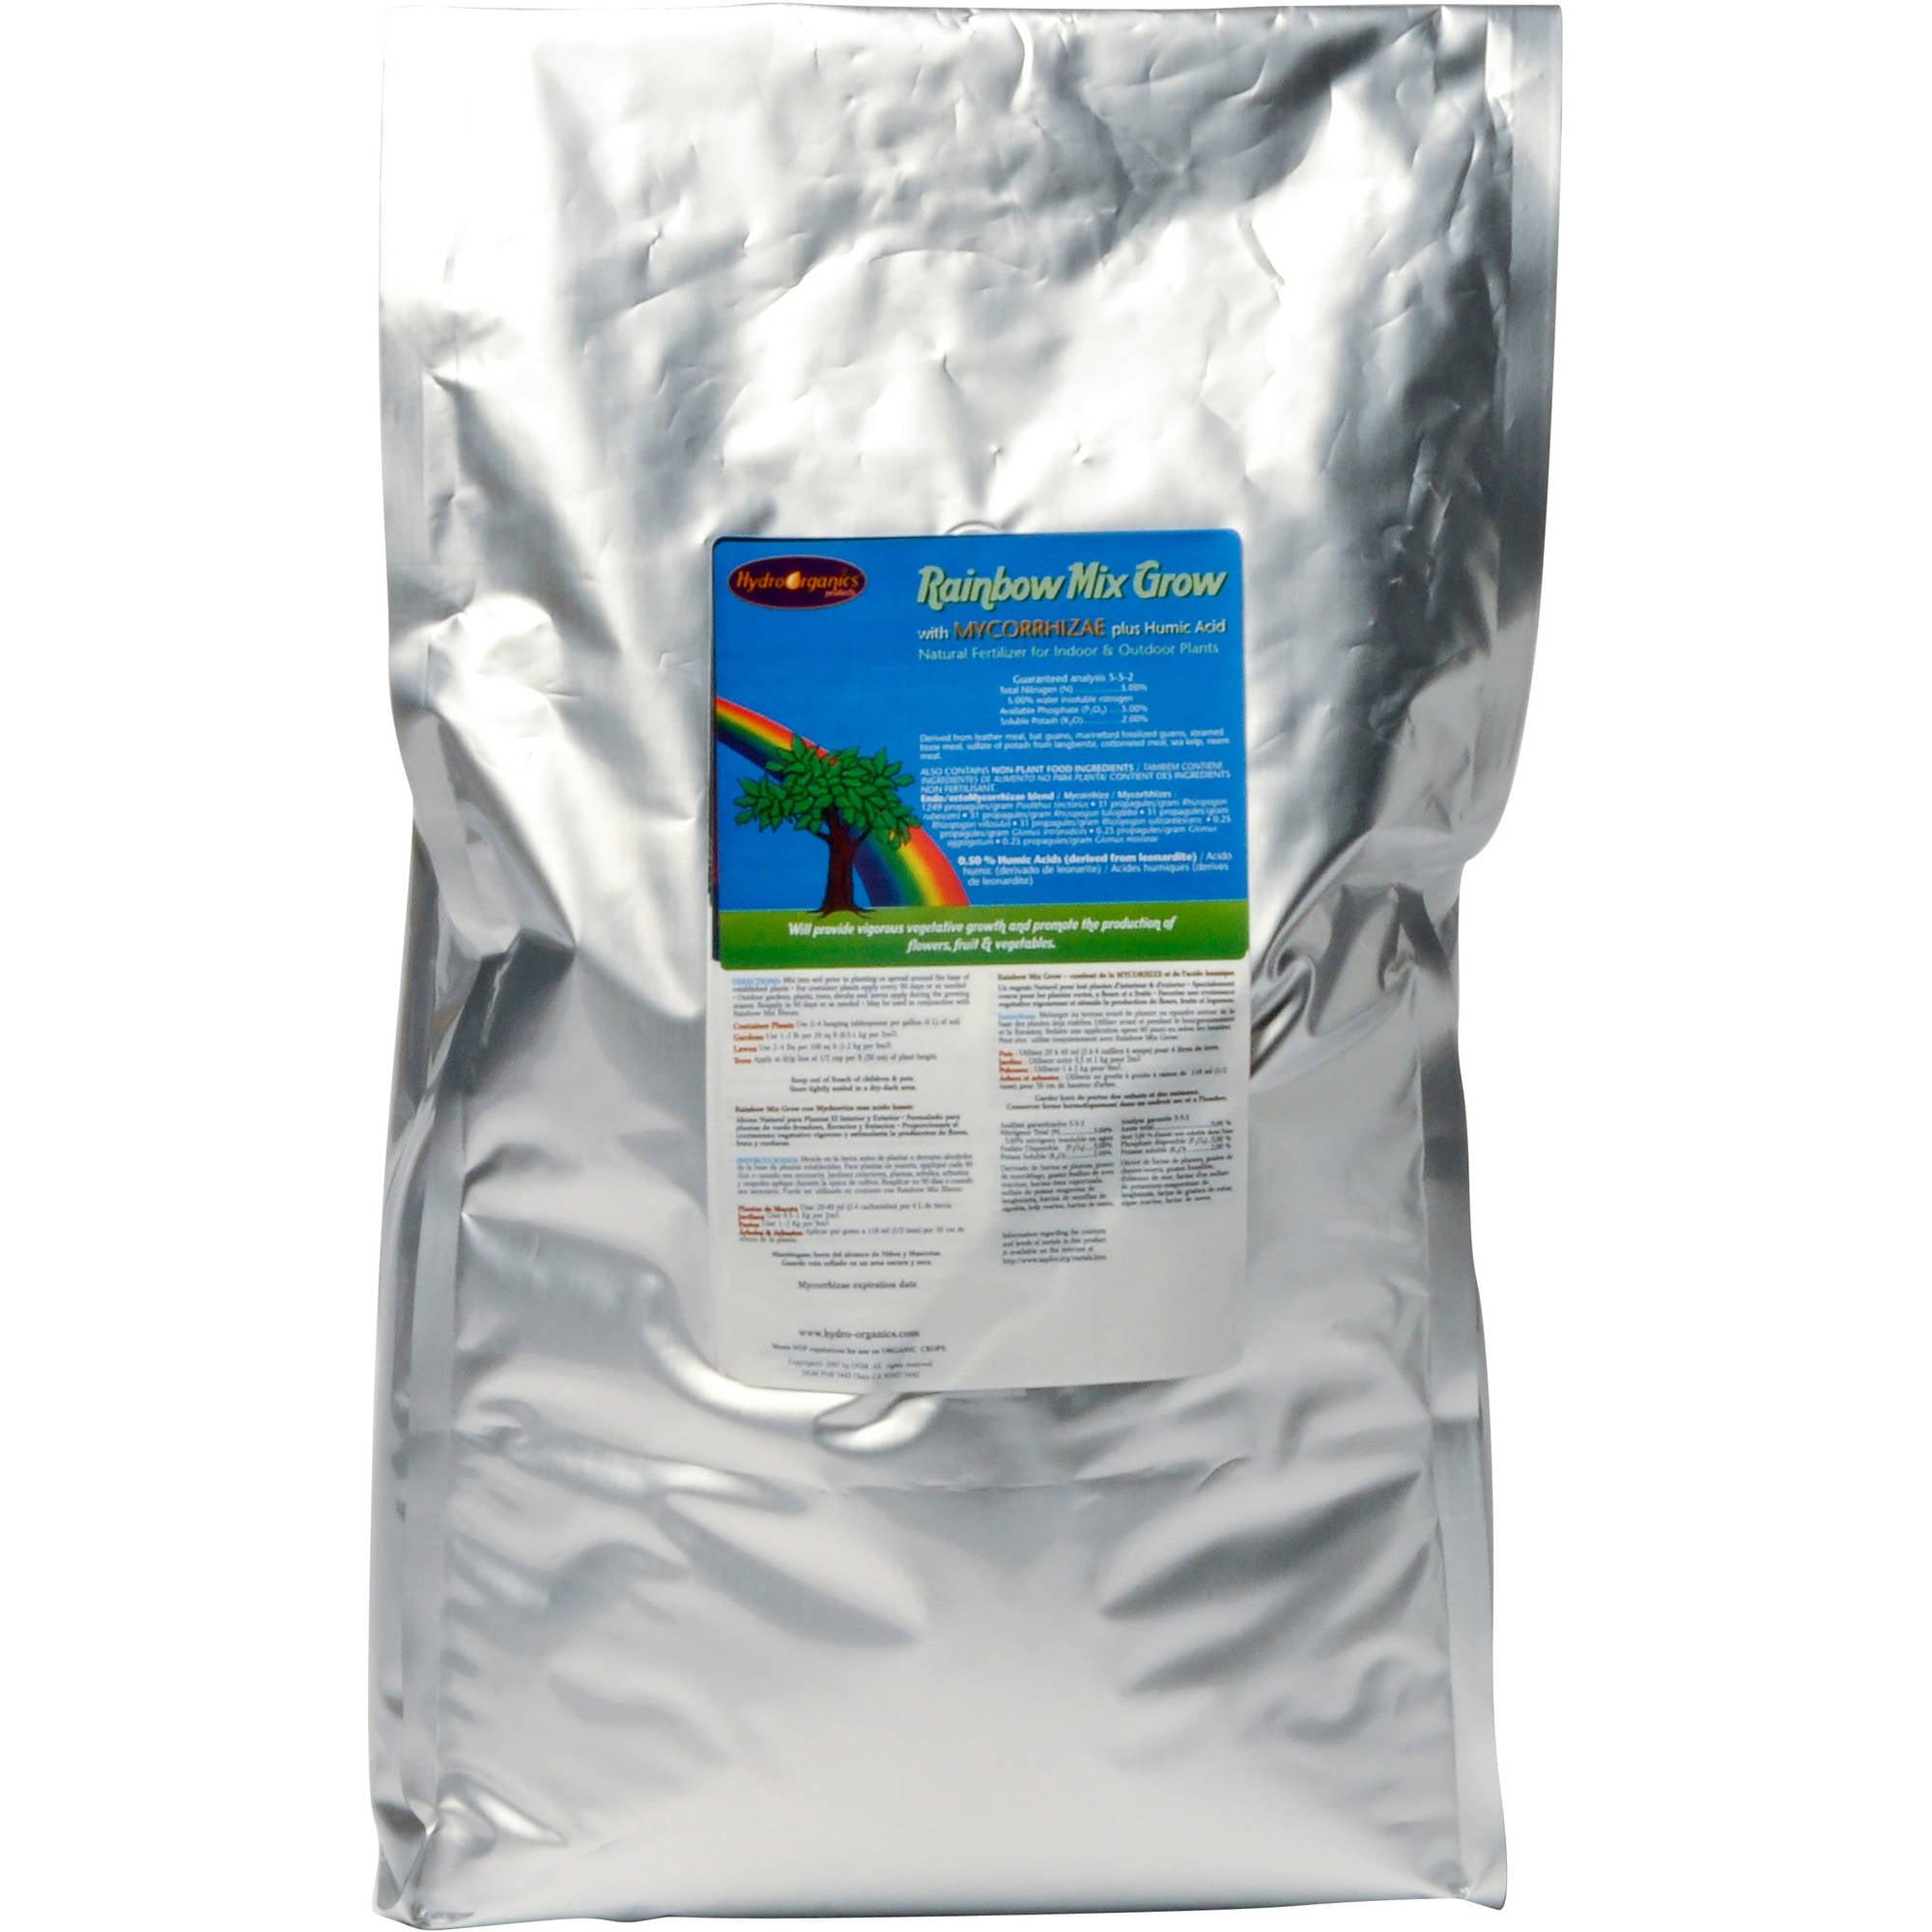 Earth Juice Rainbow Mix Pro Grow Plant Food Nutrients, 40 lbs